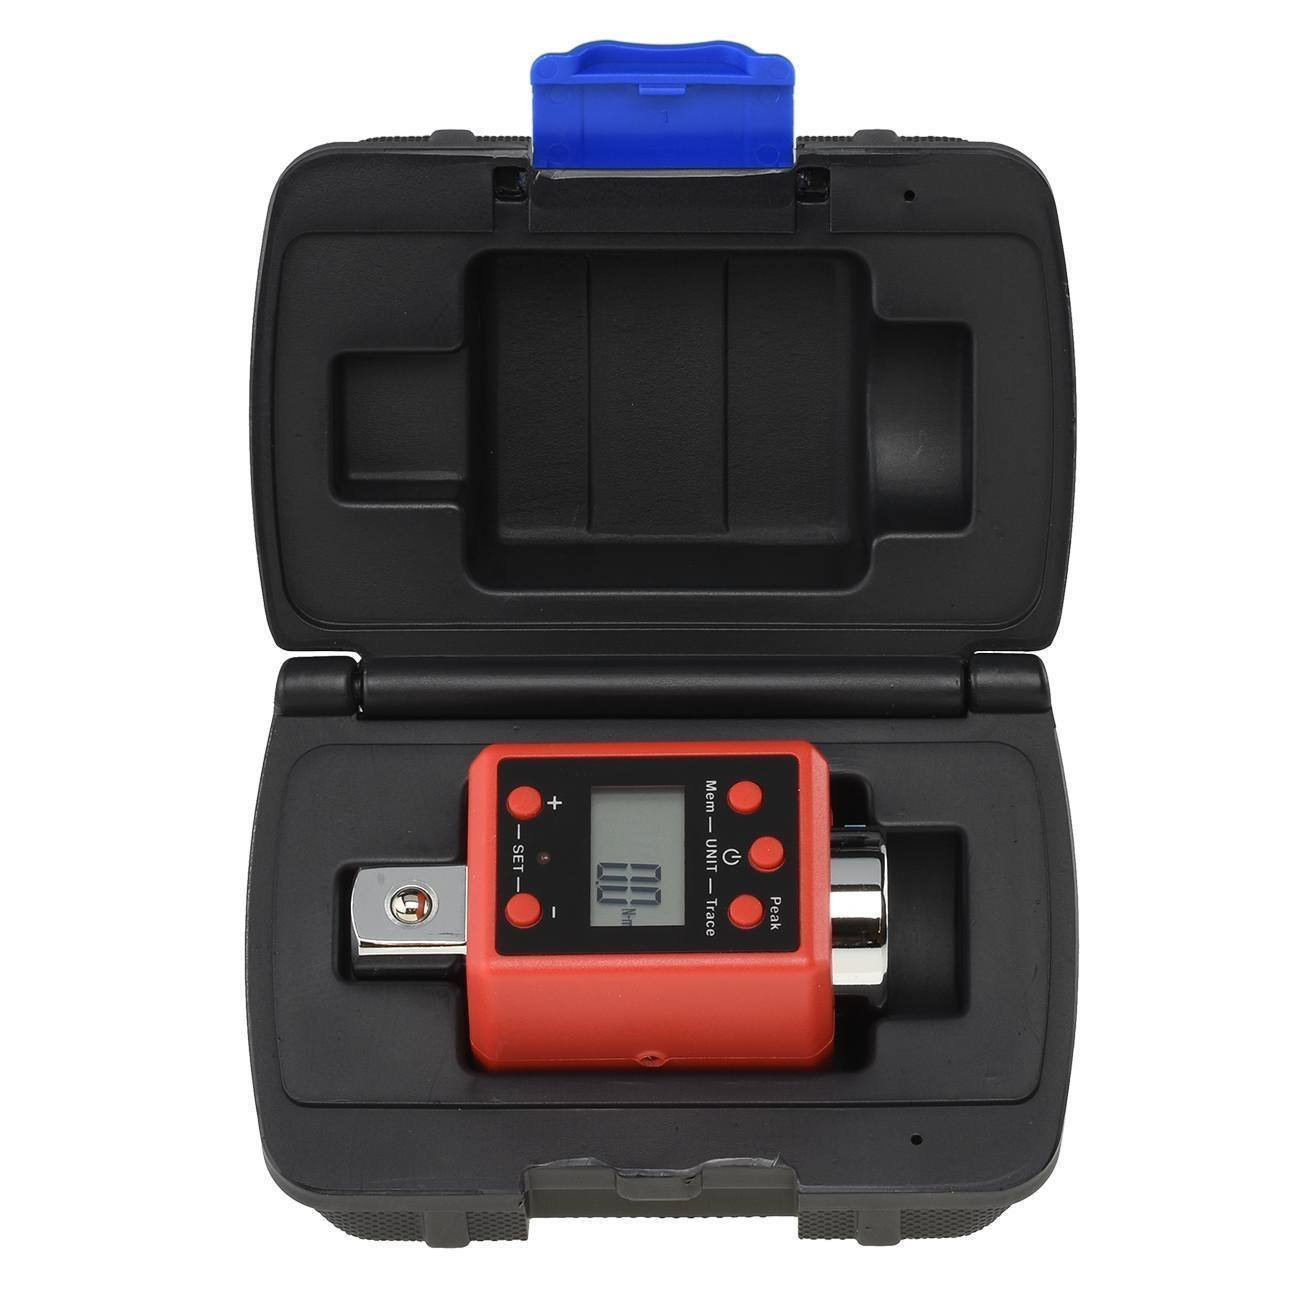 "ESKALEX>>Digital Torque Adapters 3/8"" inch Drive Socket Multi Setting Digital Torque Adapter 3/8"" Range:27-135 N-m (14.7-99.6 ft./lb.) Accuracy: 2% Memory:50 Target value setting: Peak"